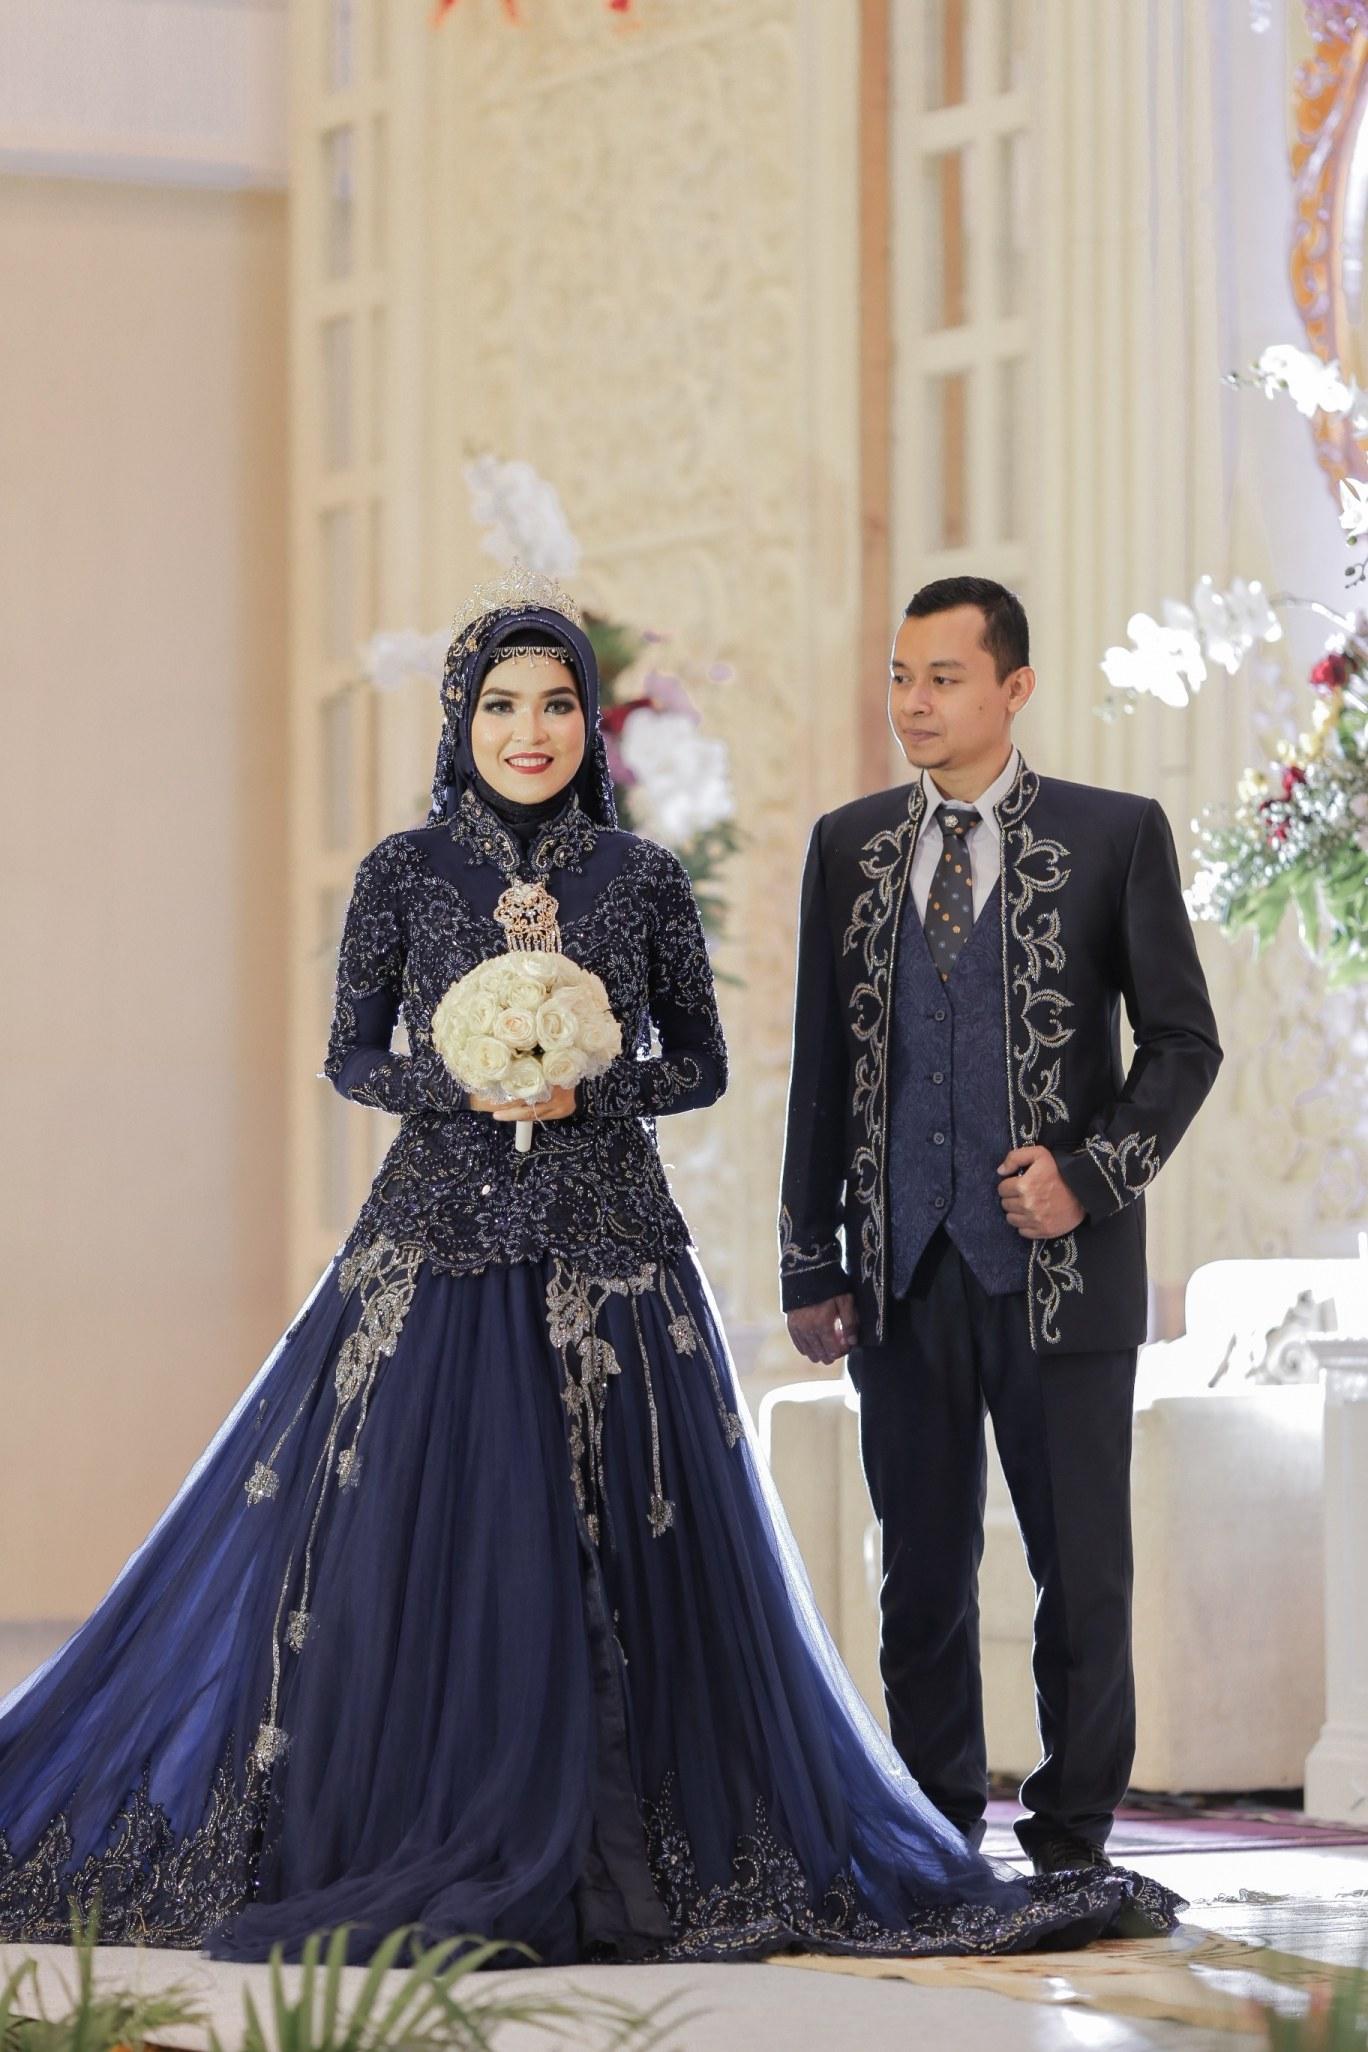 Inspirasi Gaun Pengantin Muslim Adat Jawa E6d5 57 Contoh Baju Pengantin Navy Paling Keren Modelbaju